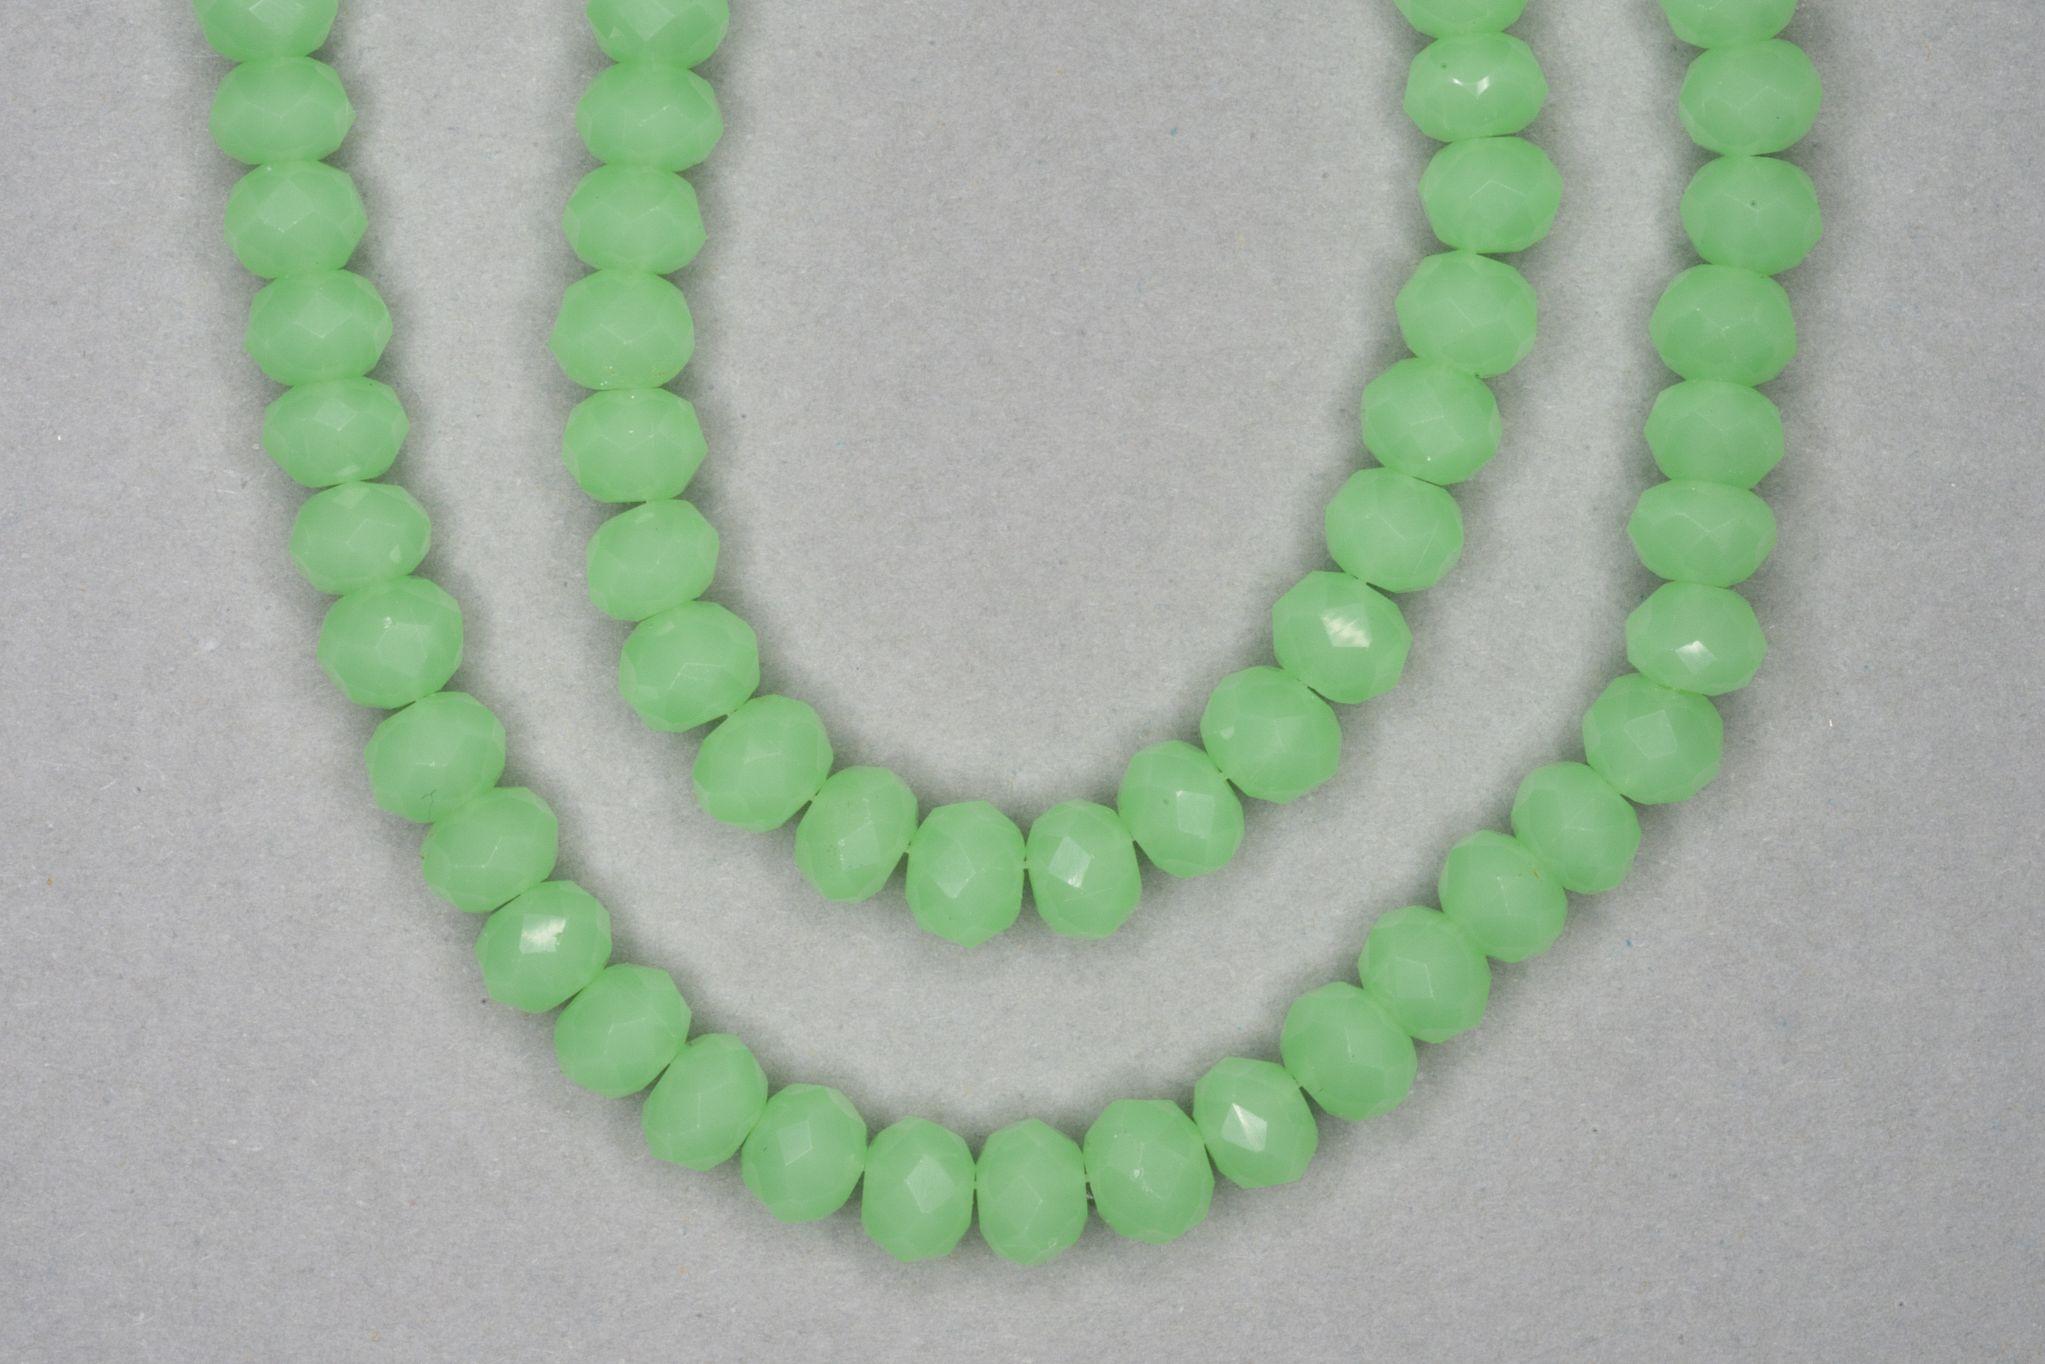 Opaque Light Green Faceted Glass Beads